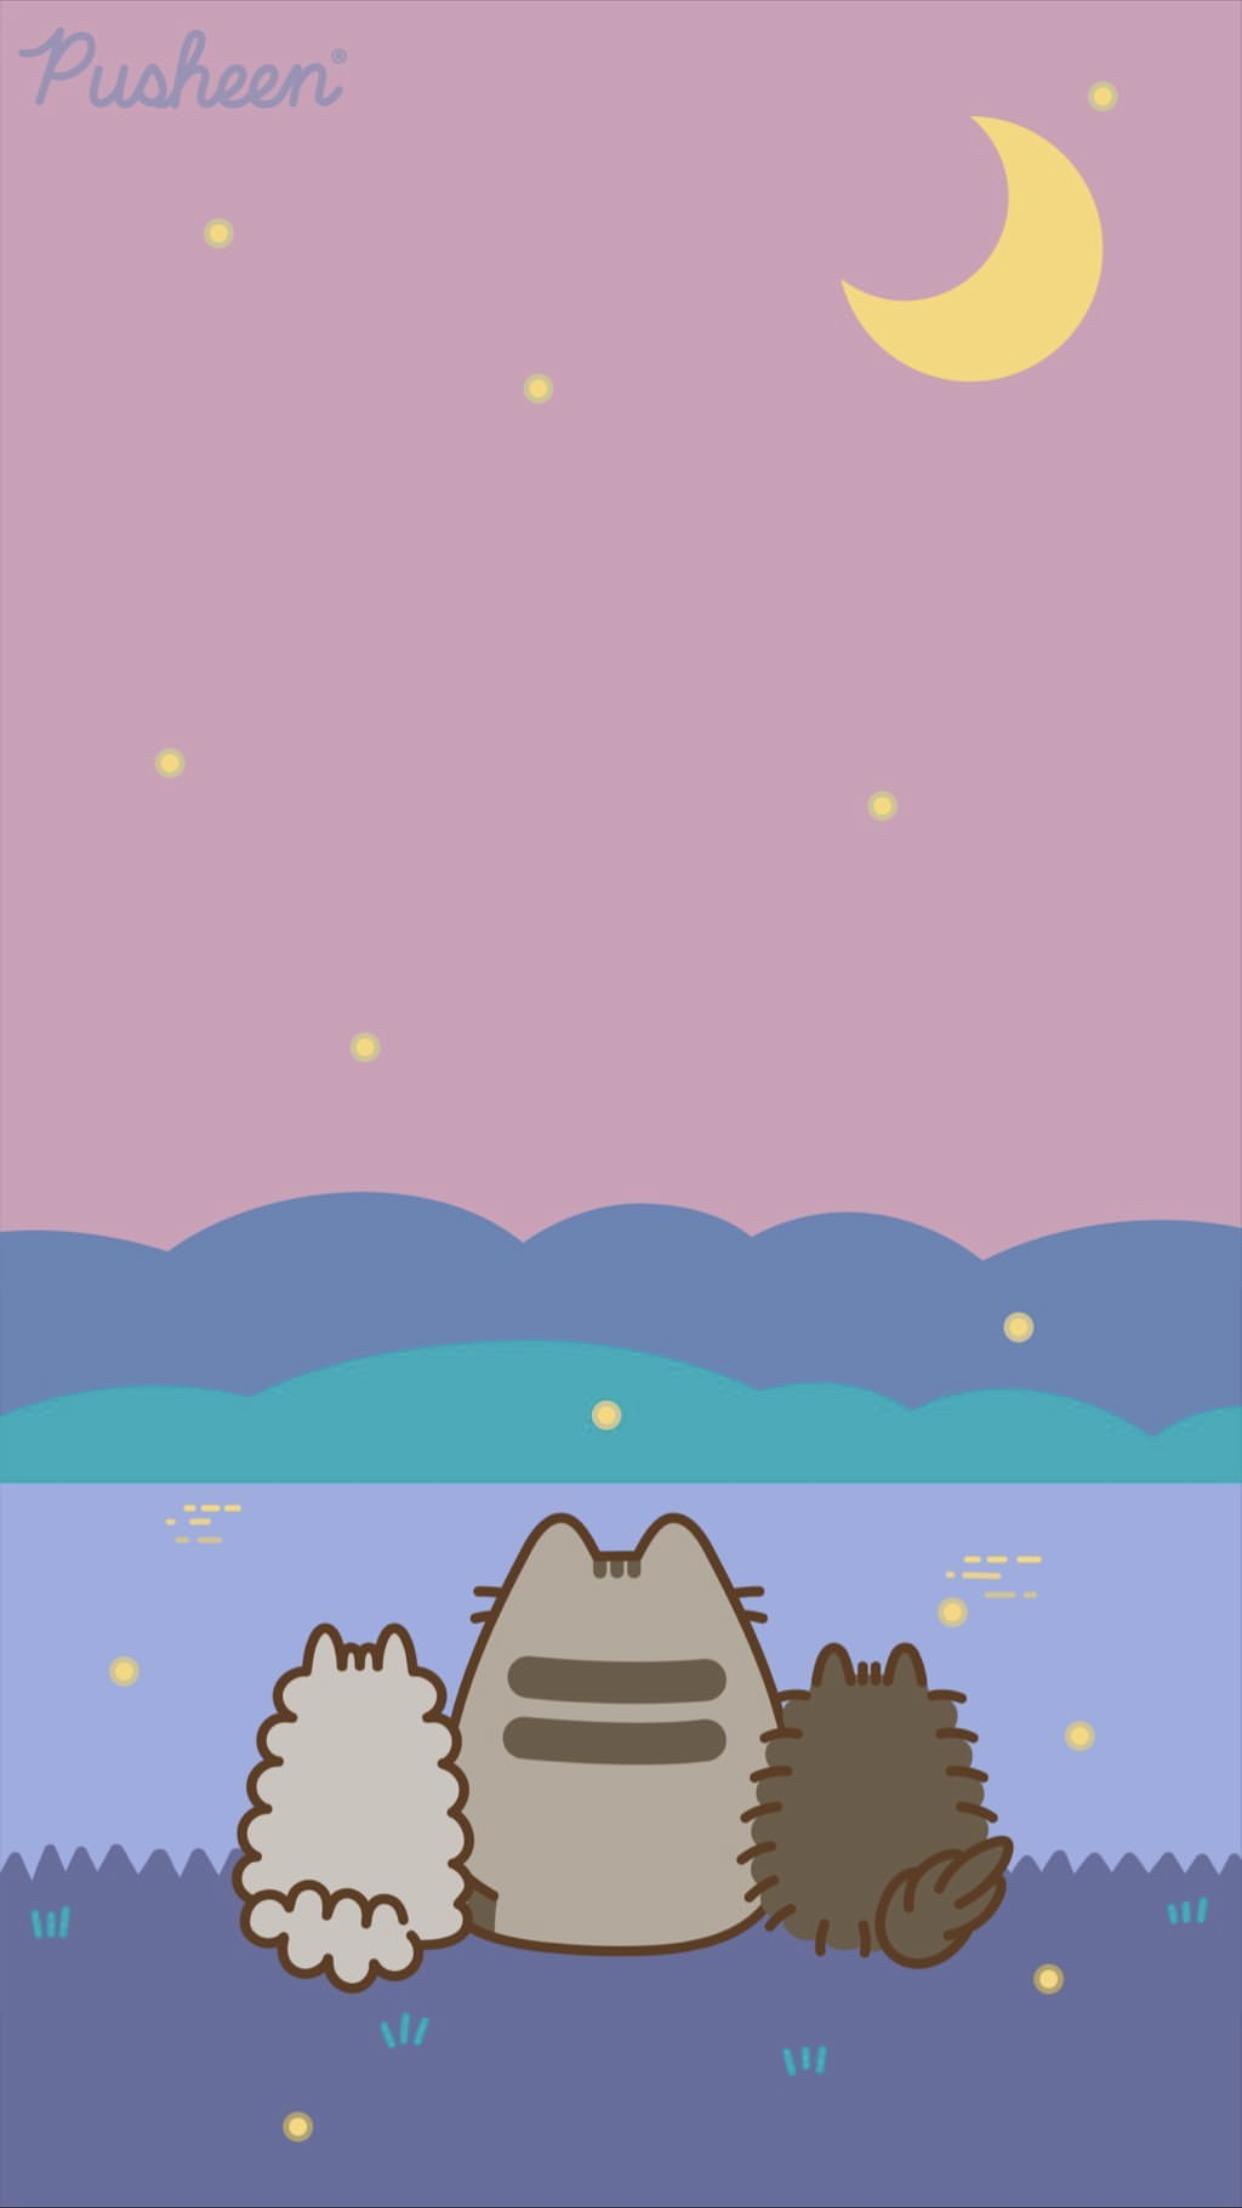 Pusheen cat iphone wallpaper summer nights moon camping